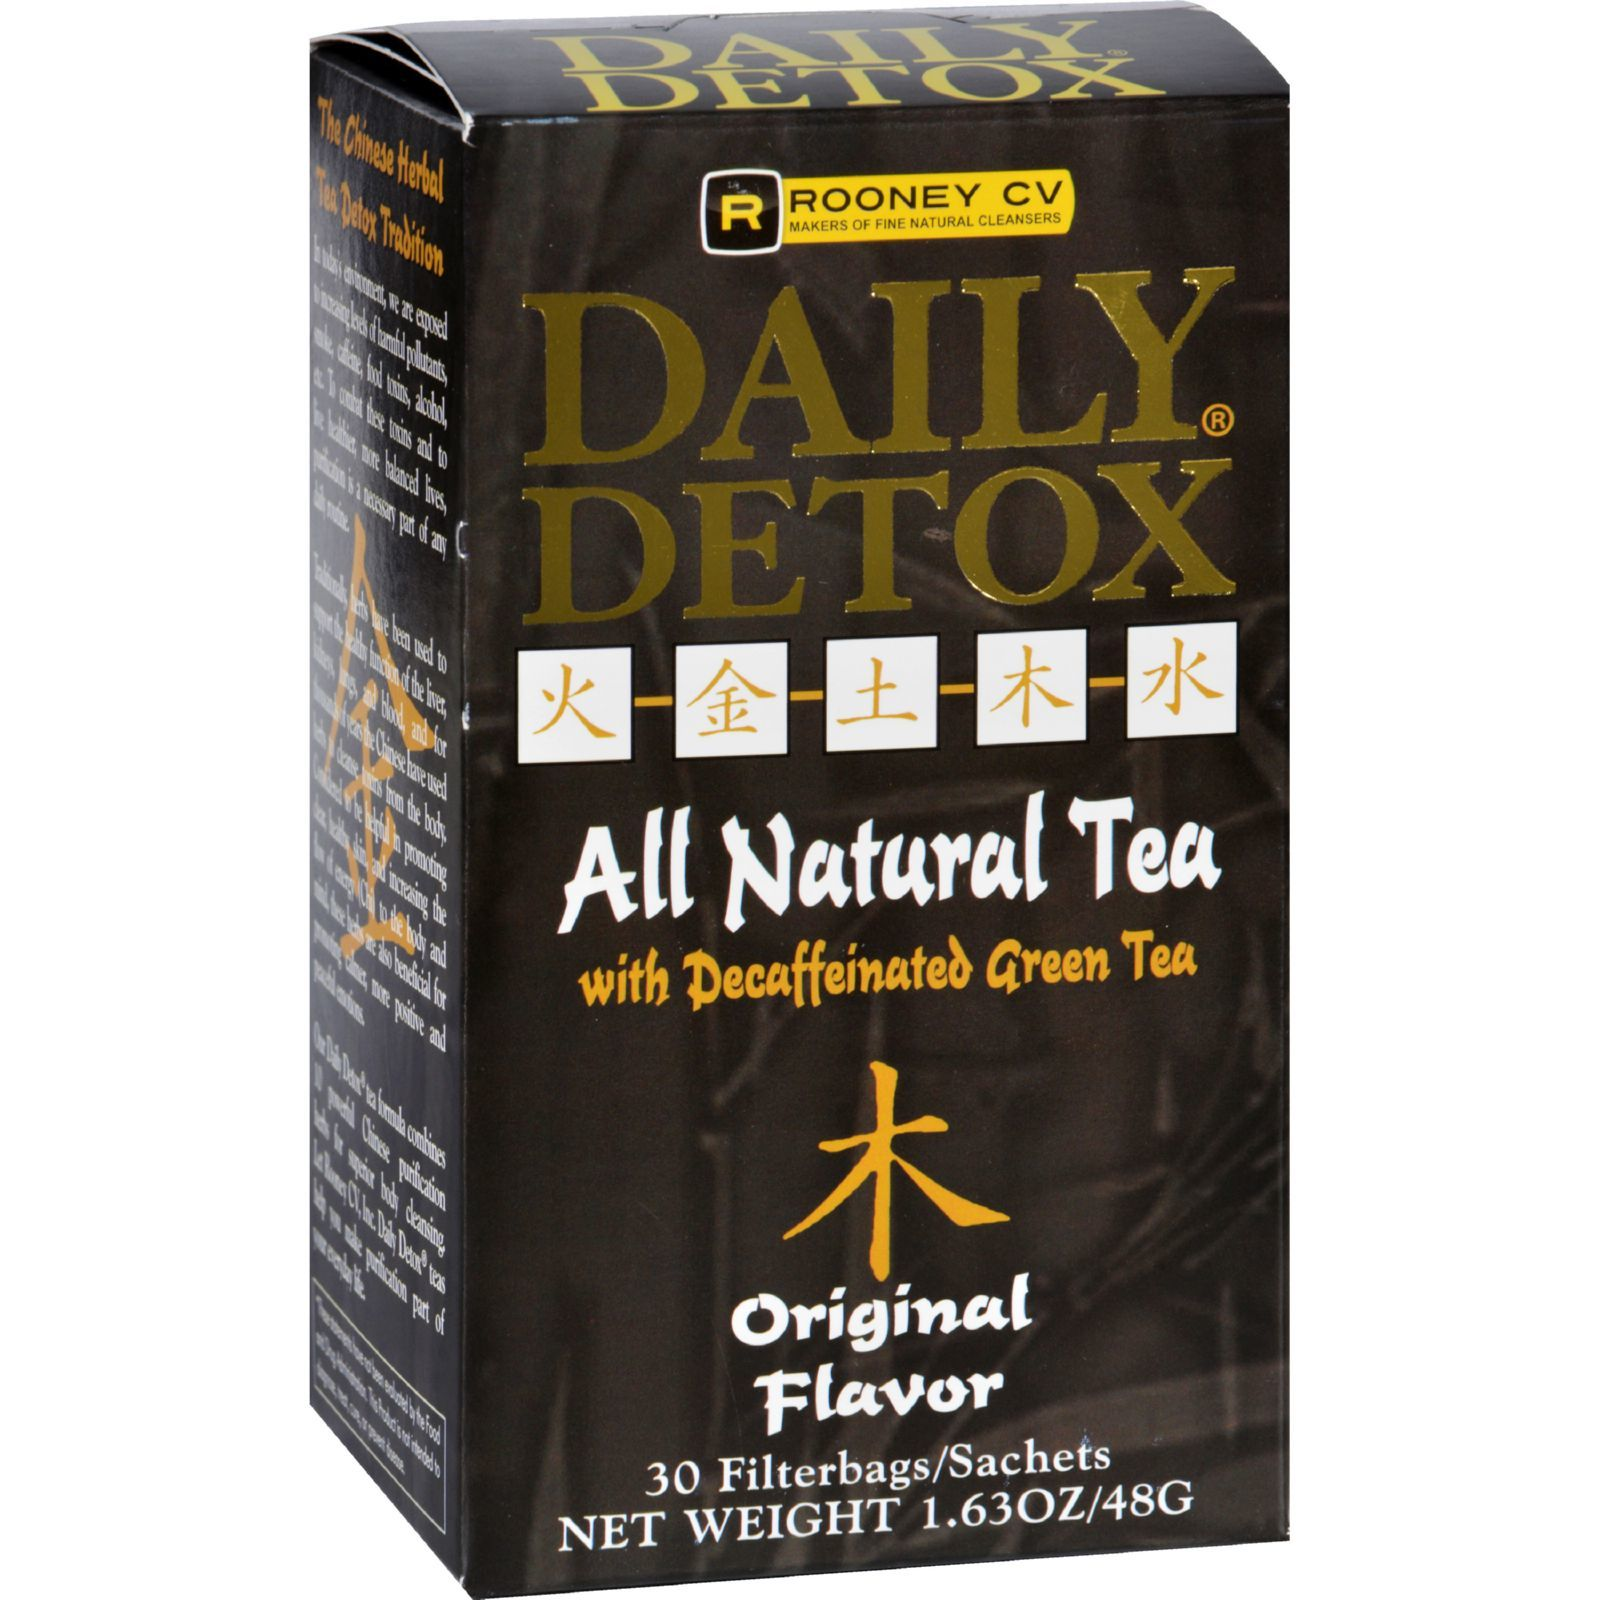 Wellements Rooney CV Daily Detox All Natural Decaffeinated Tea Original - 30 Sachet